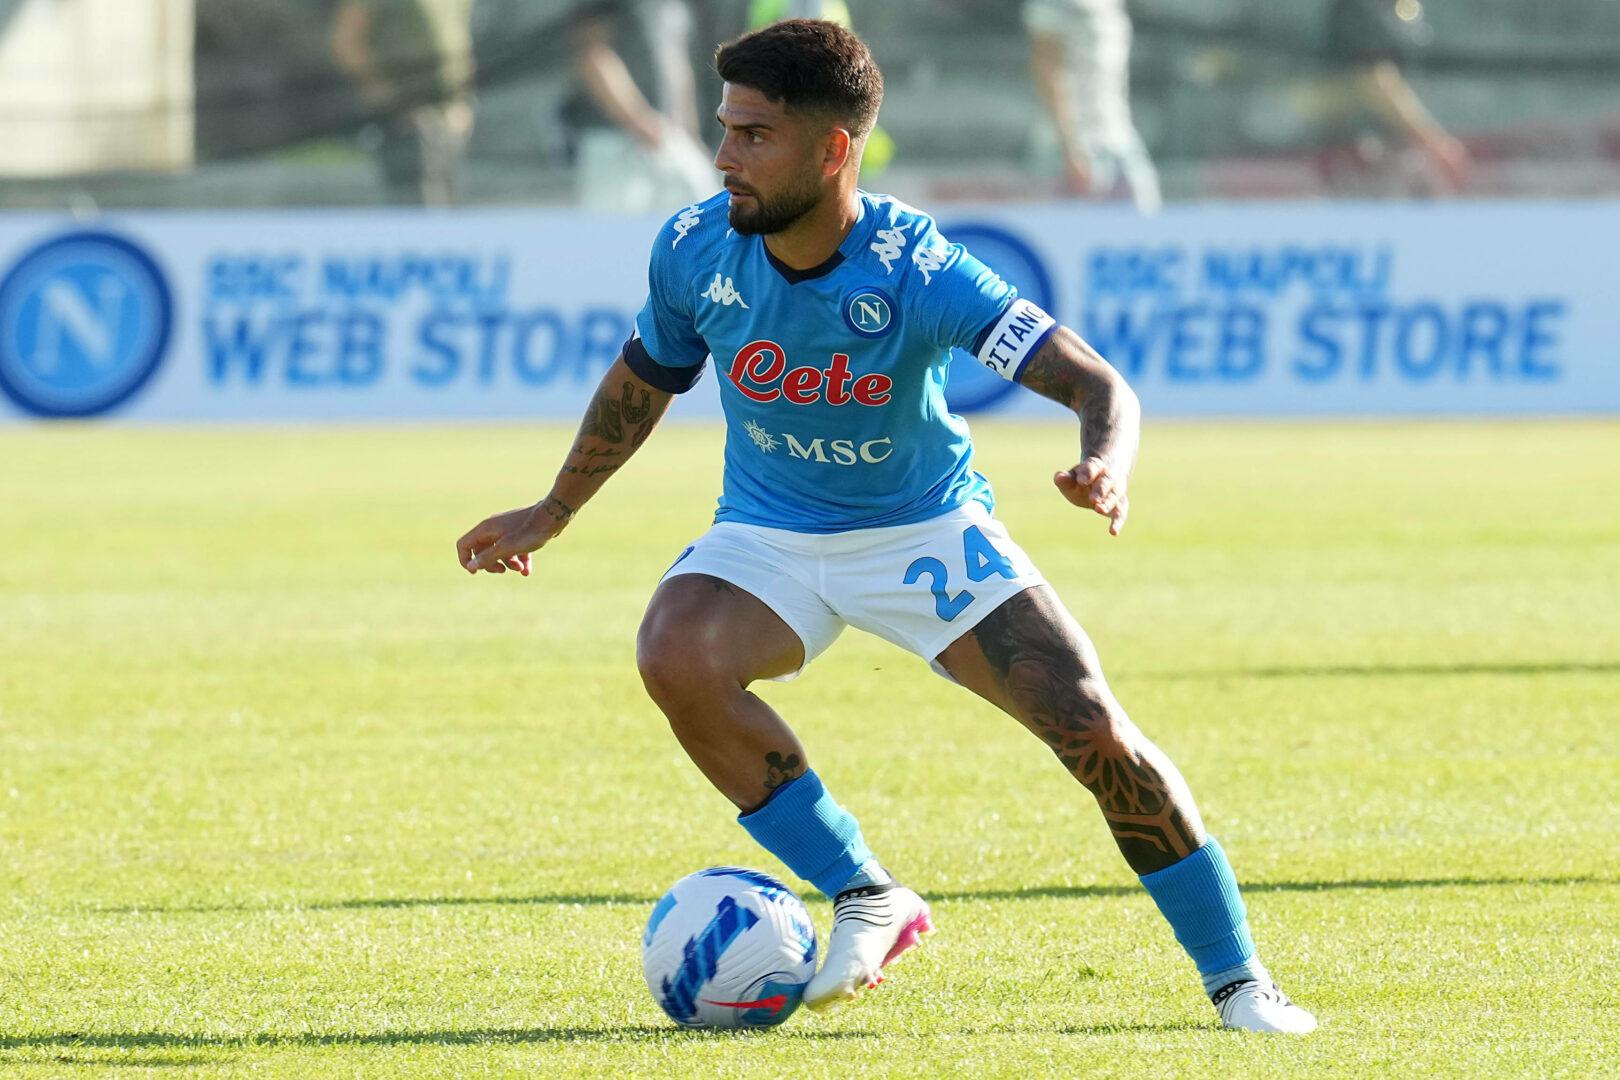 Napoli | Inter mit Interesse an Insigne?